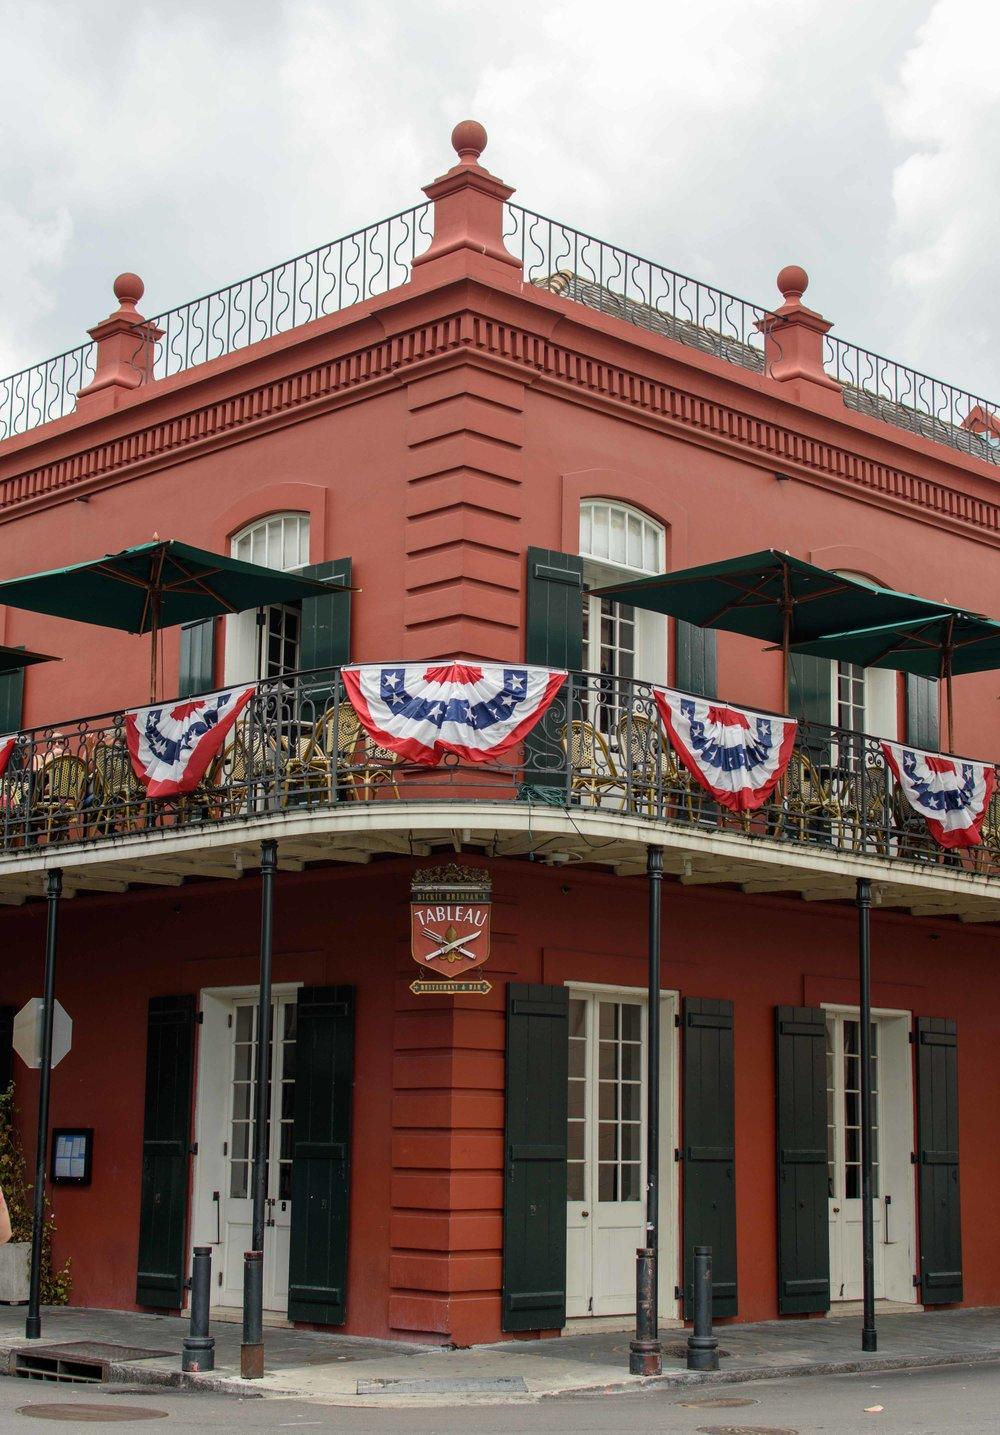 new orleans tableau restaurant travel